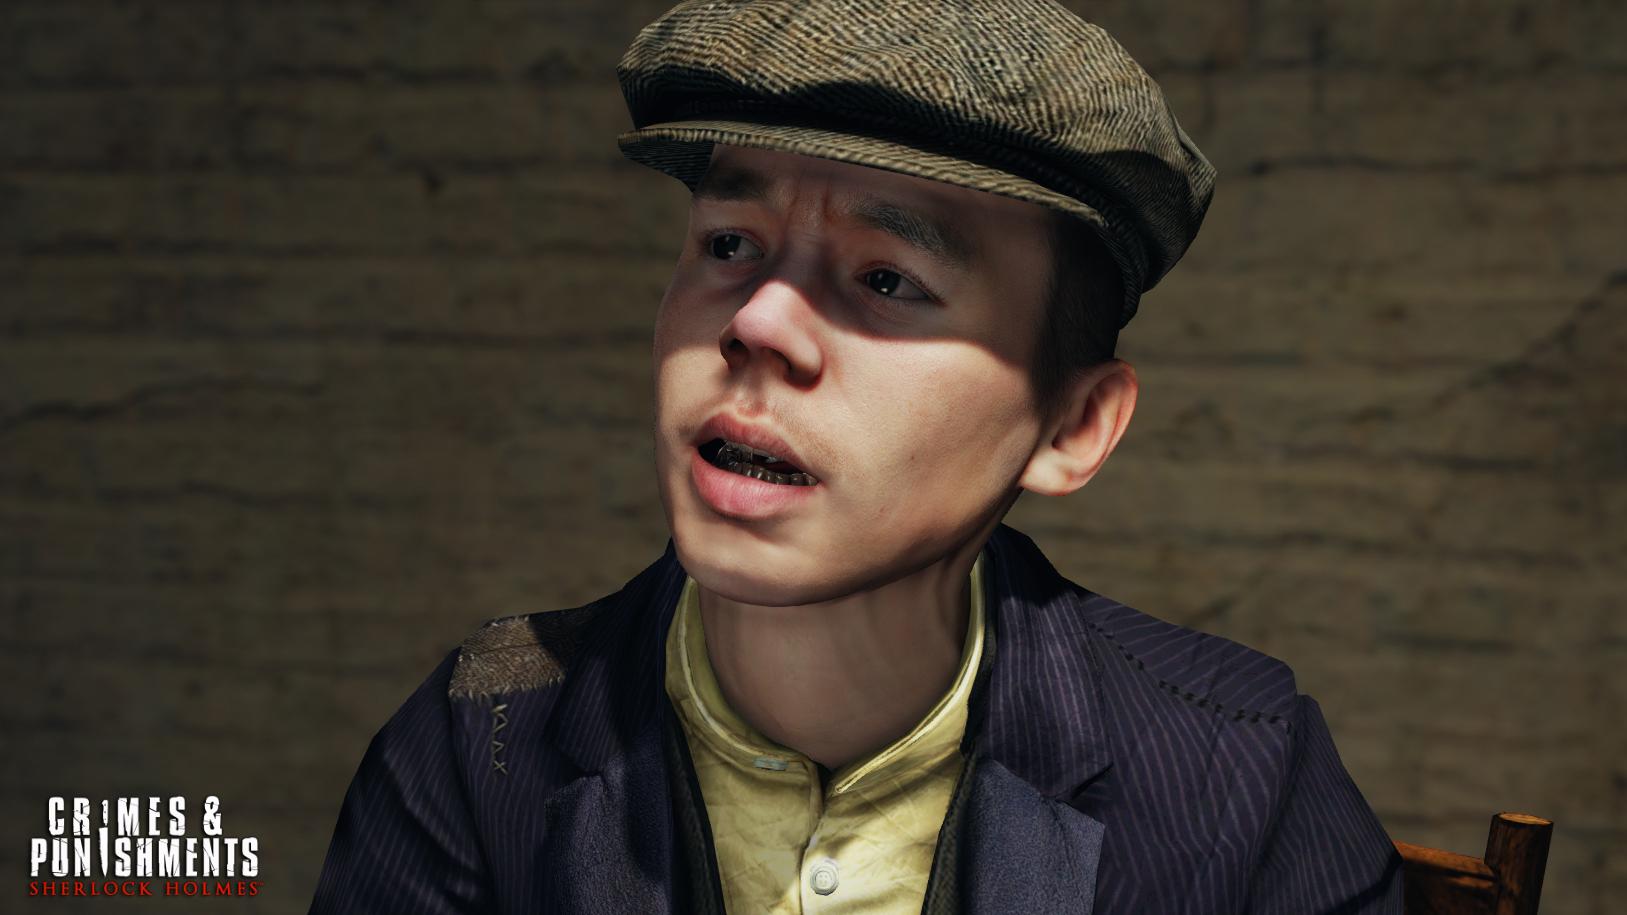 Sherlock Holmes Crimes and Punishments Trailer: A játék